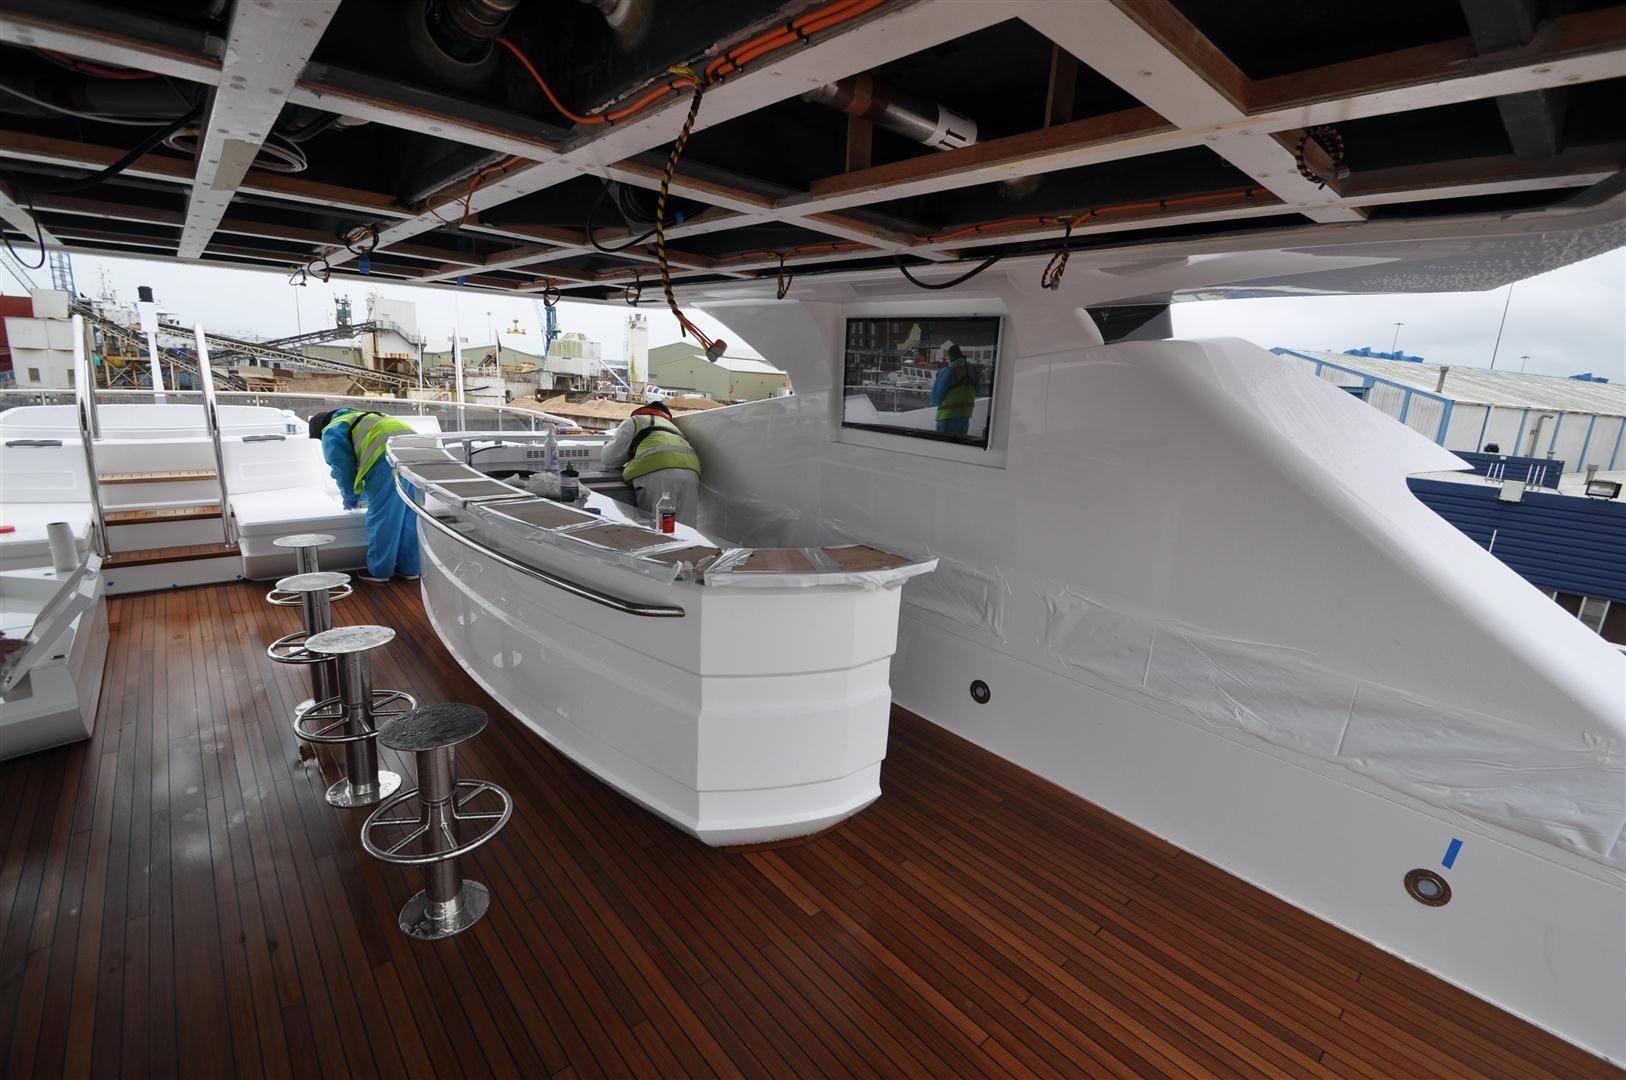 Videotree Outdoor TV installed in Sunseeker Princess AVK Yacht in Sky Deck Bar Area